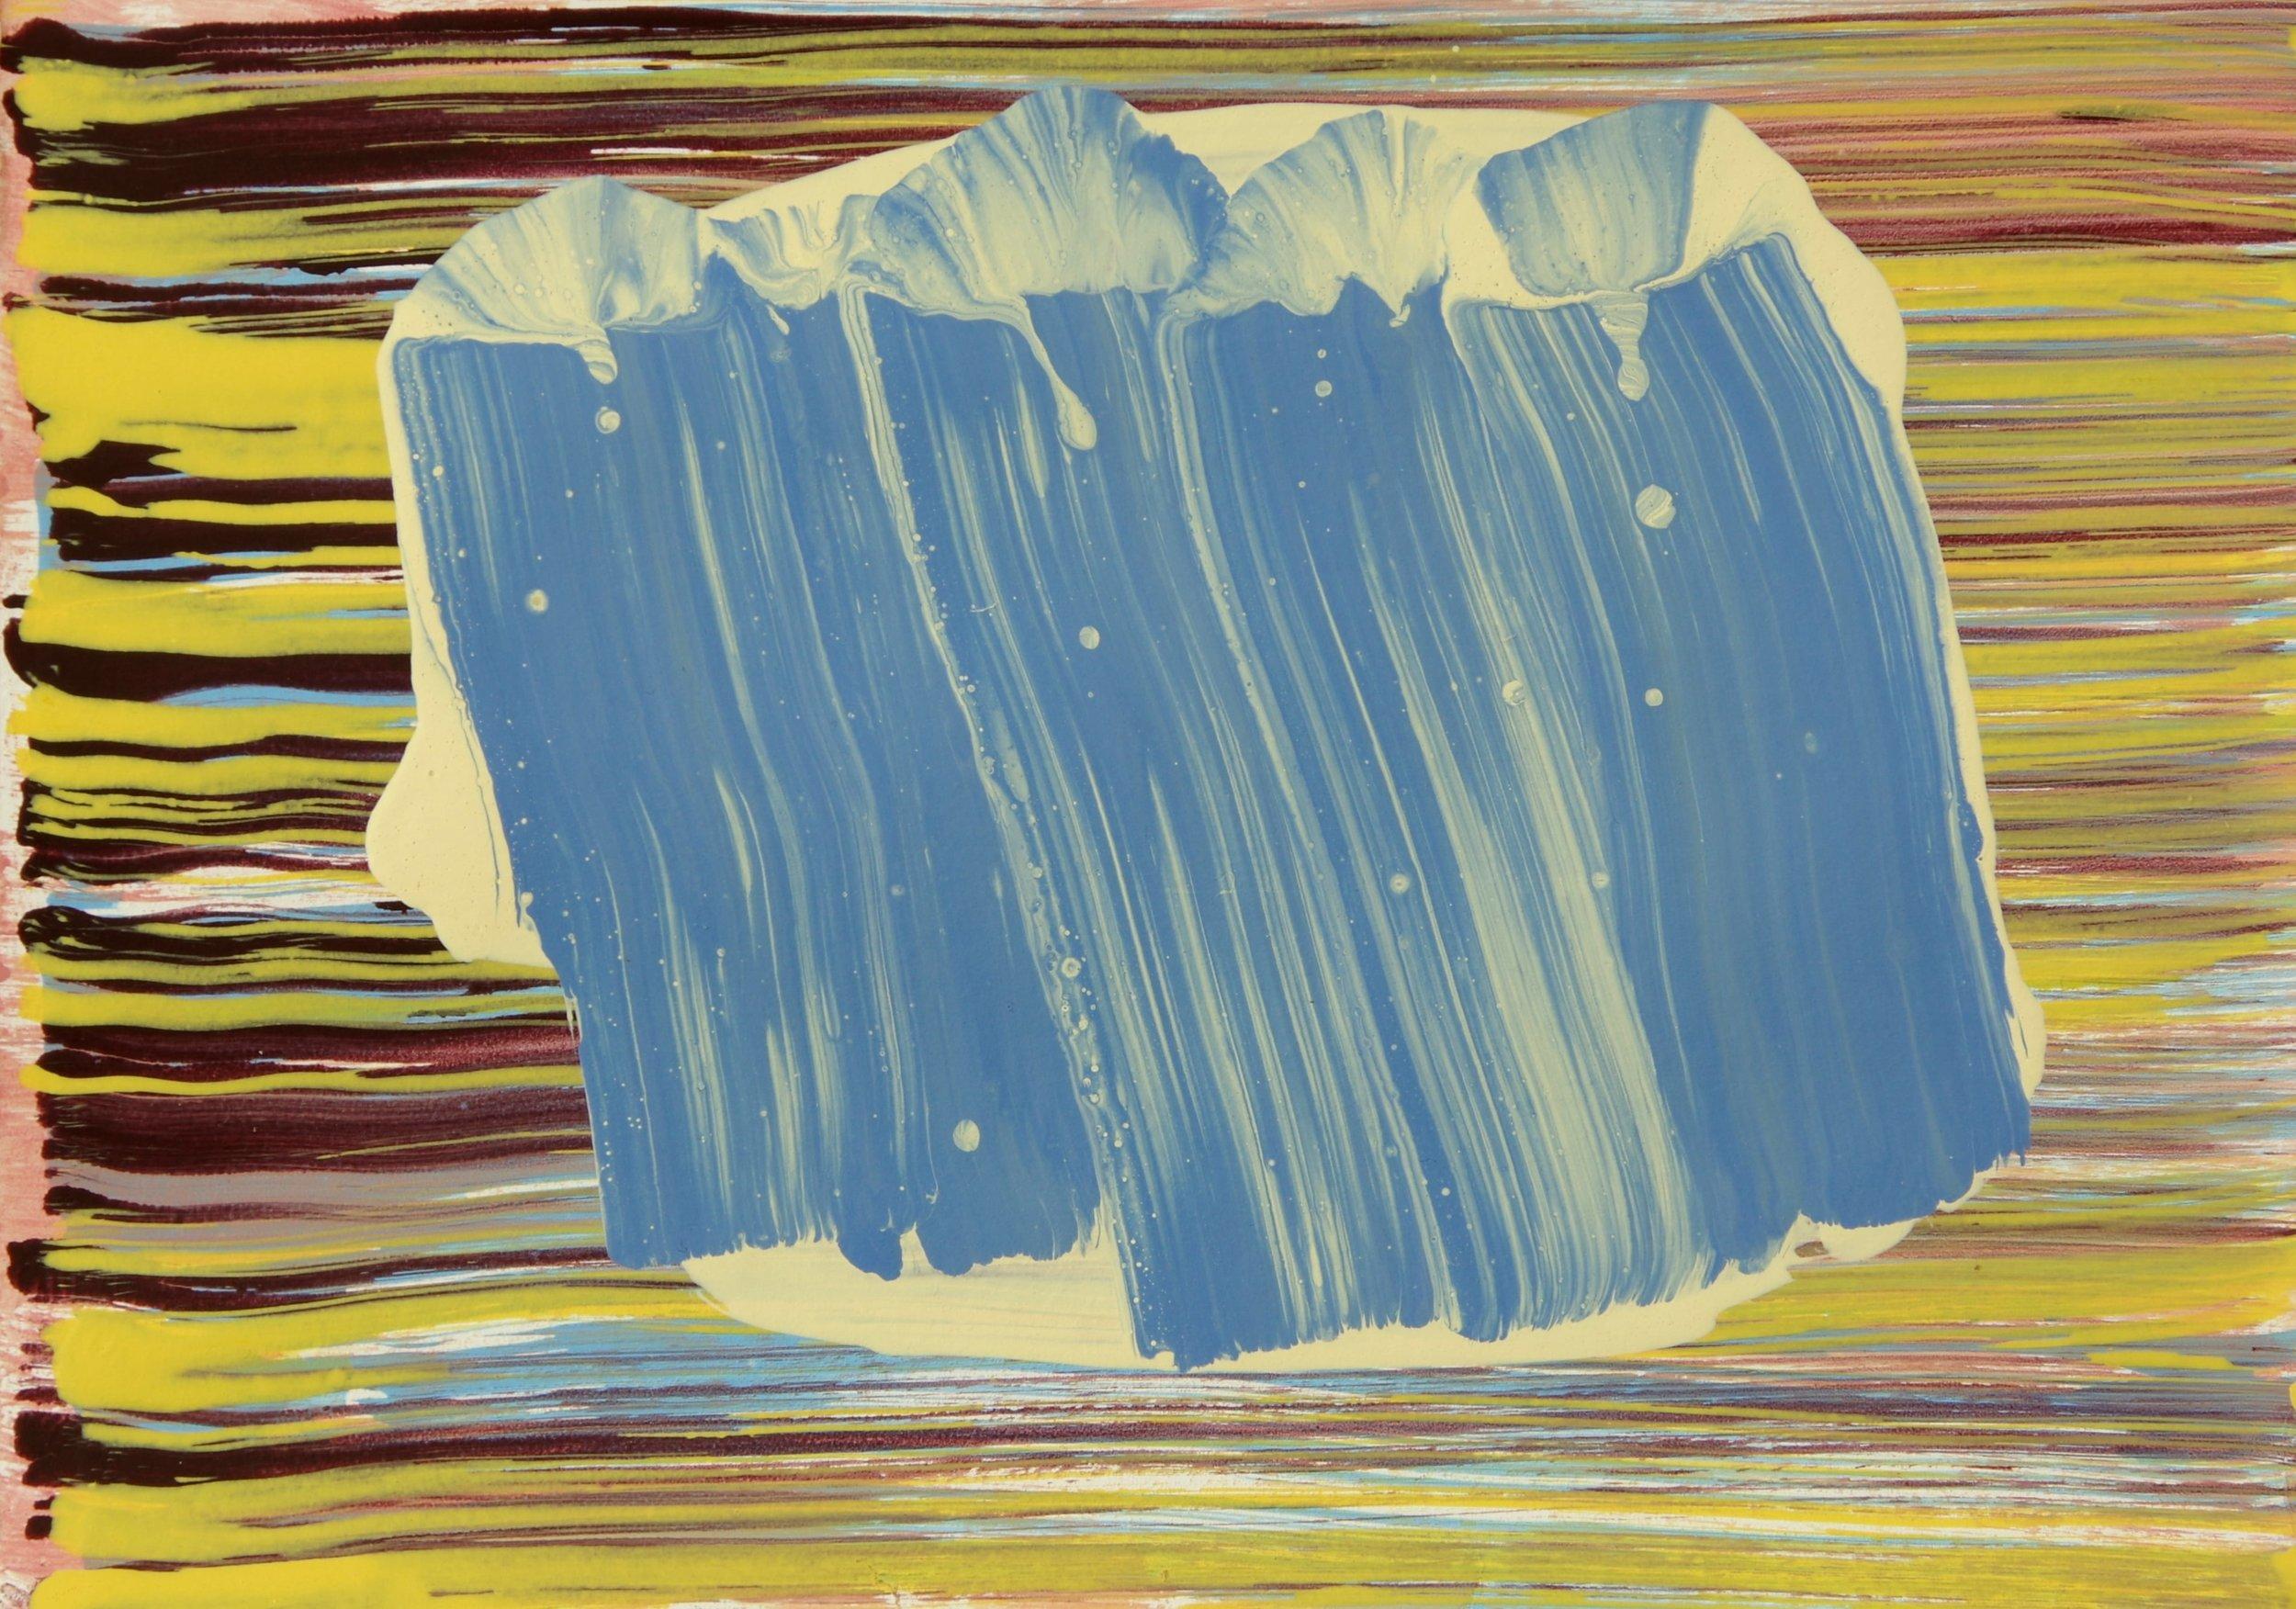 Blue Gesture 2  2016, 21 x 29.5cm acrylic on paper